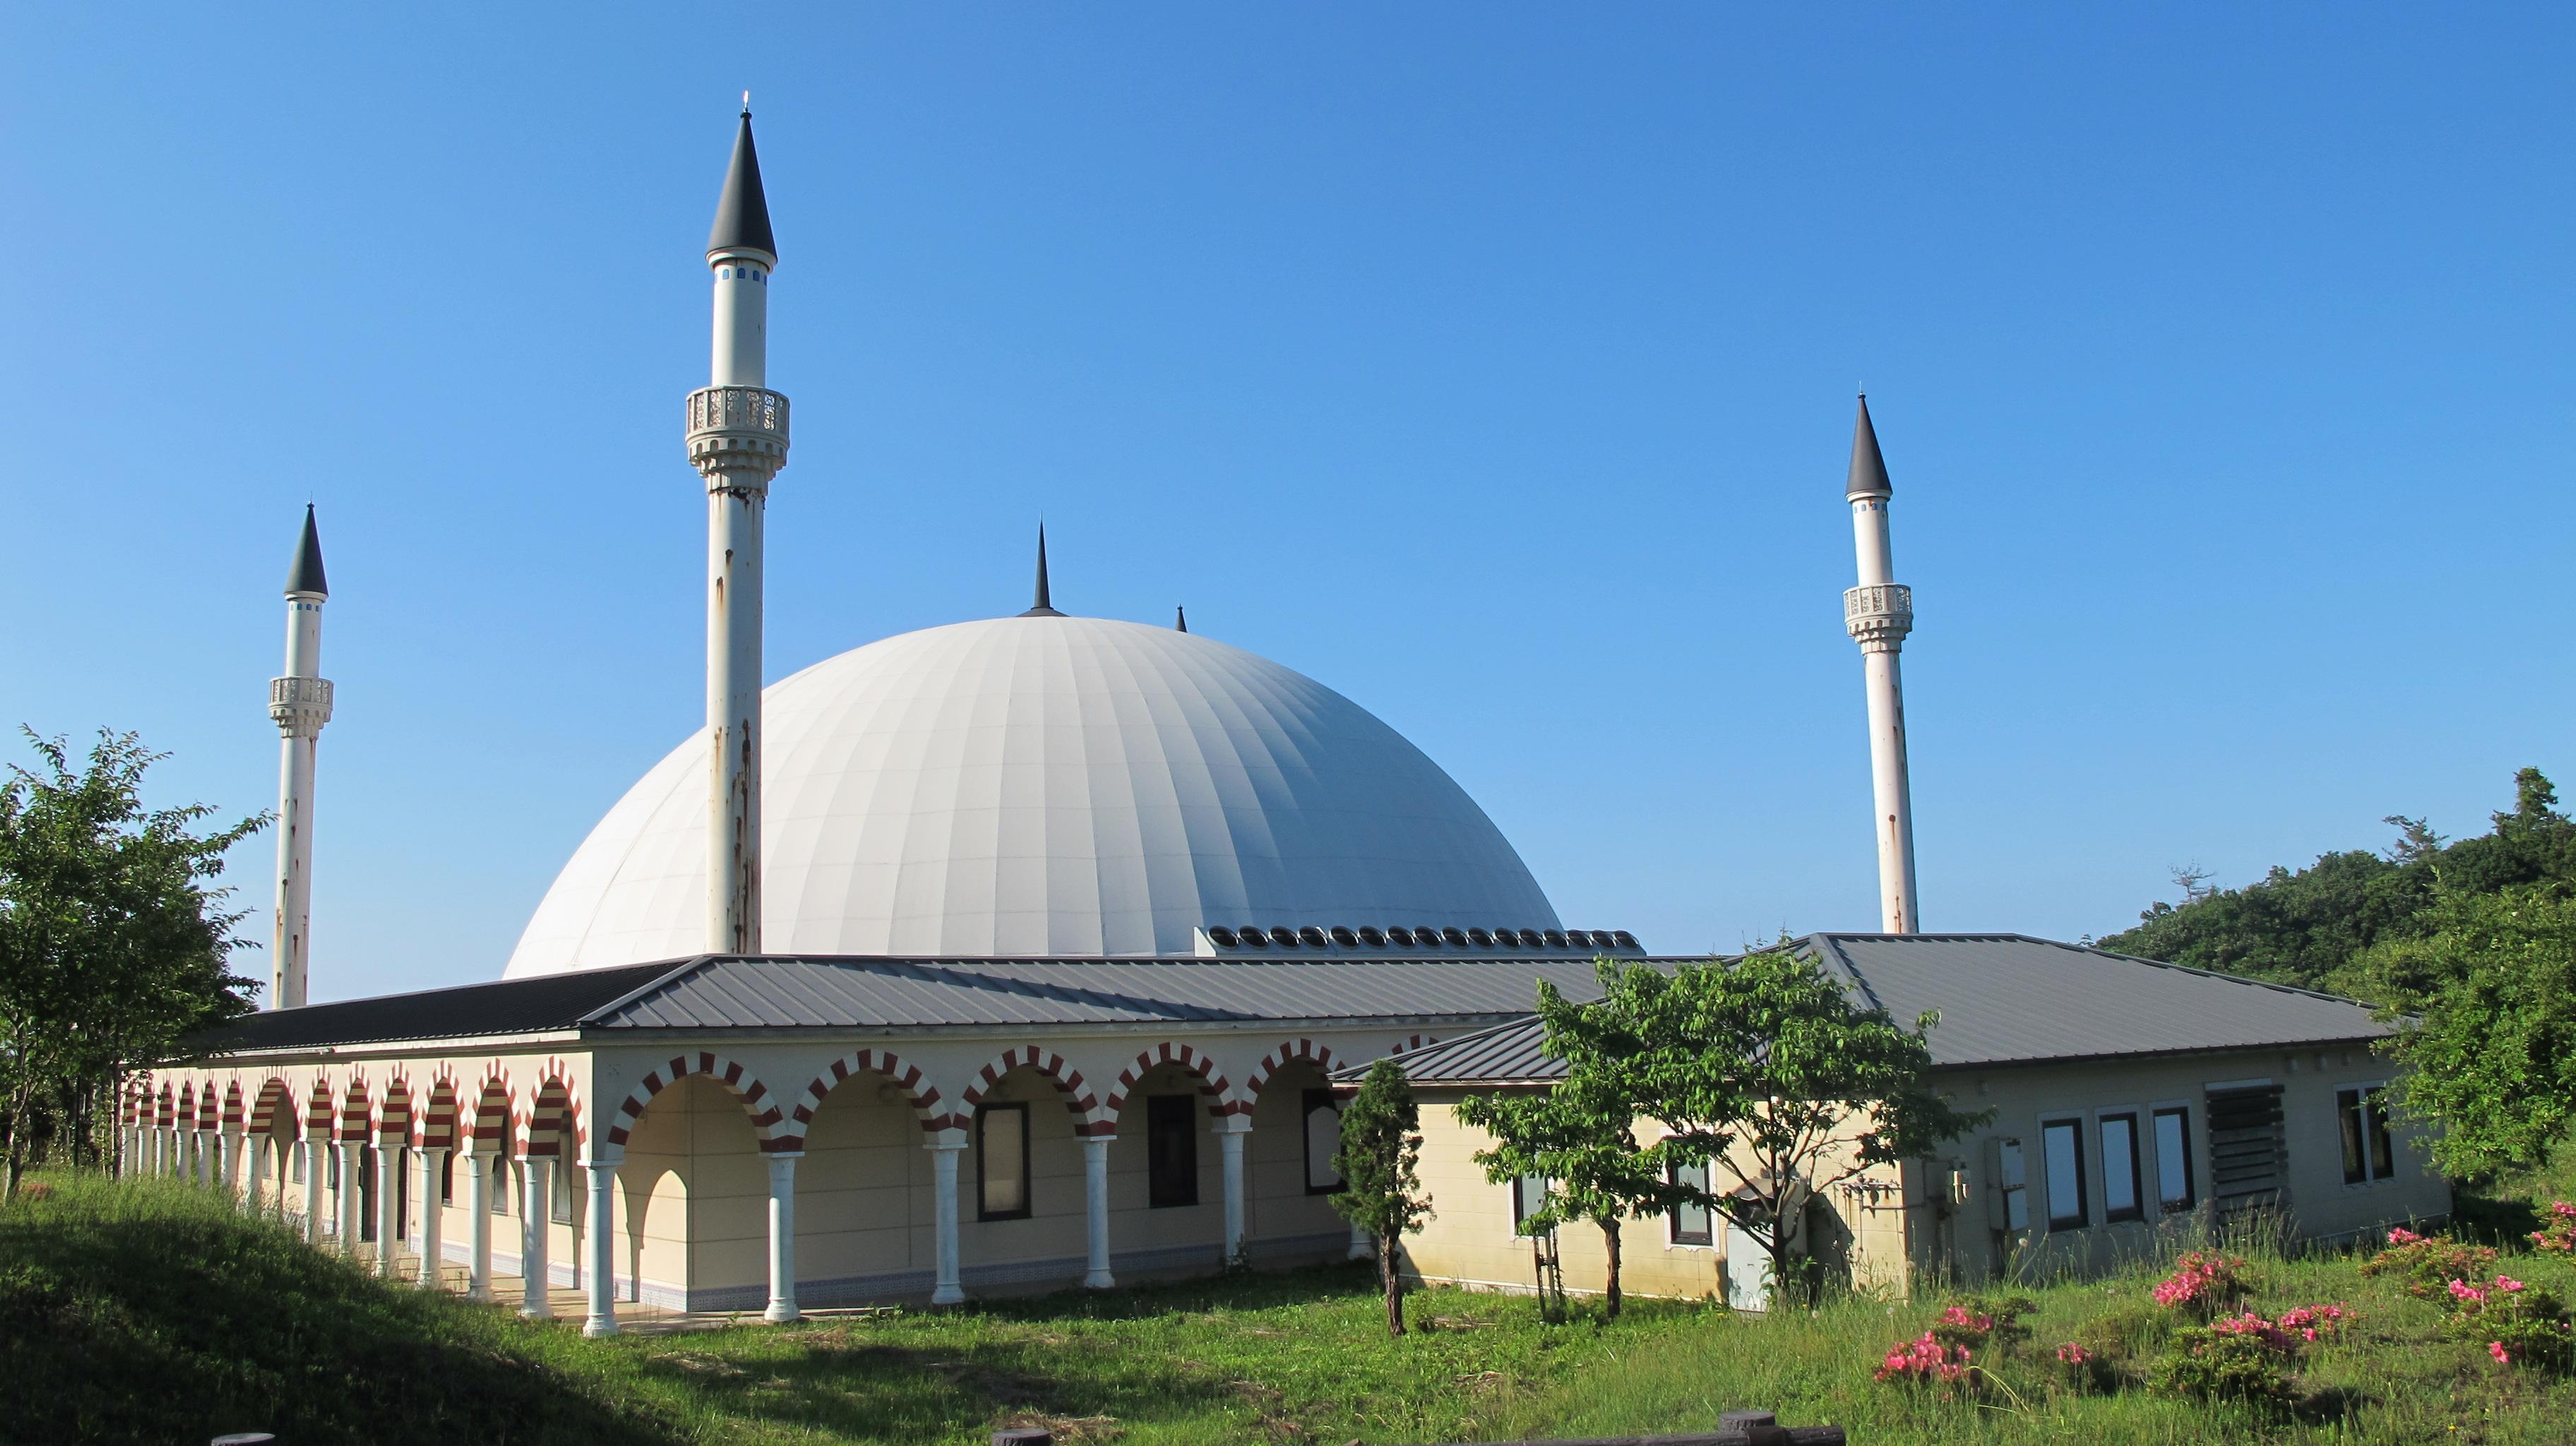 turkish essay Famous historic buildings & archaeological sites in turkey istanbul, blue mosque, hagia sophia, topkapi palace, ephesus, side.